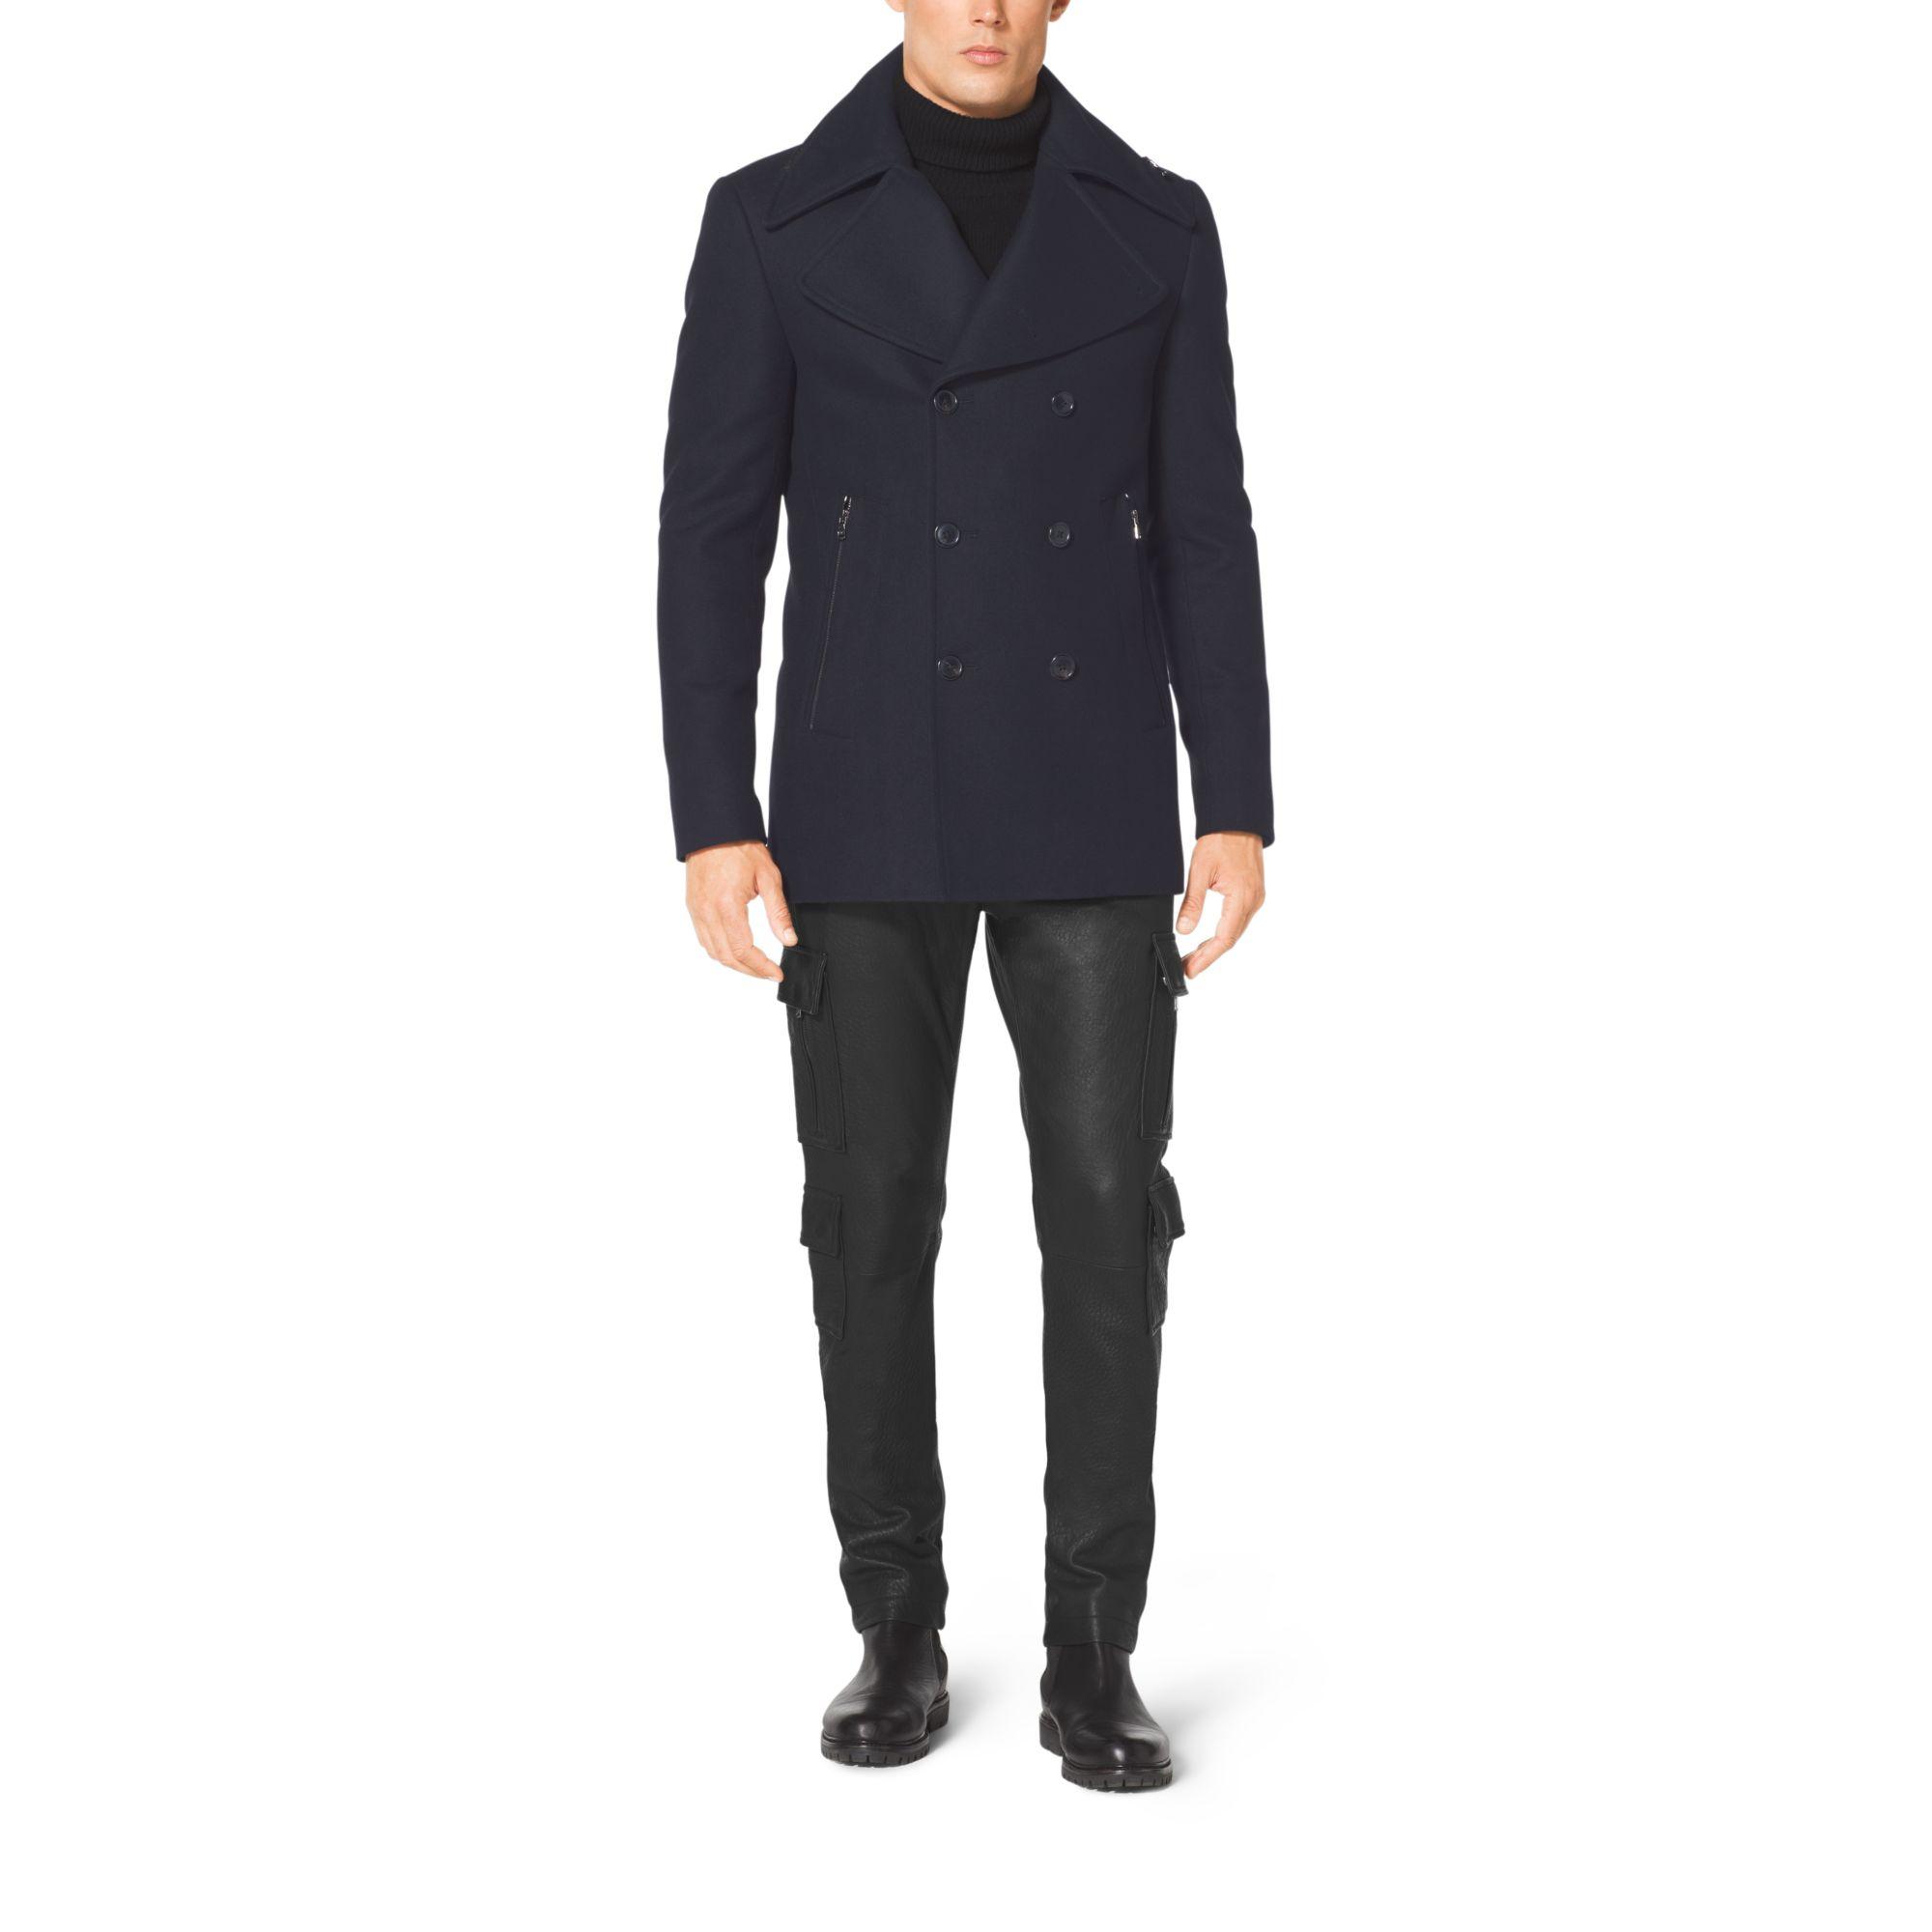 michael kors melton wool peacoat in blue for men lyst. Black Bedroom Furniture Sets. Home Design Ideas